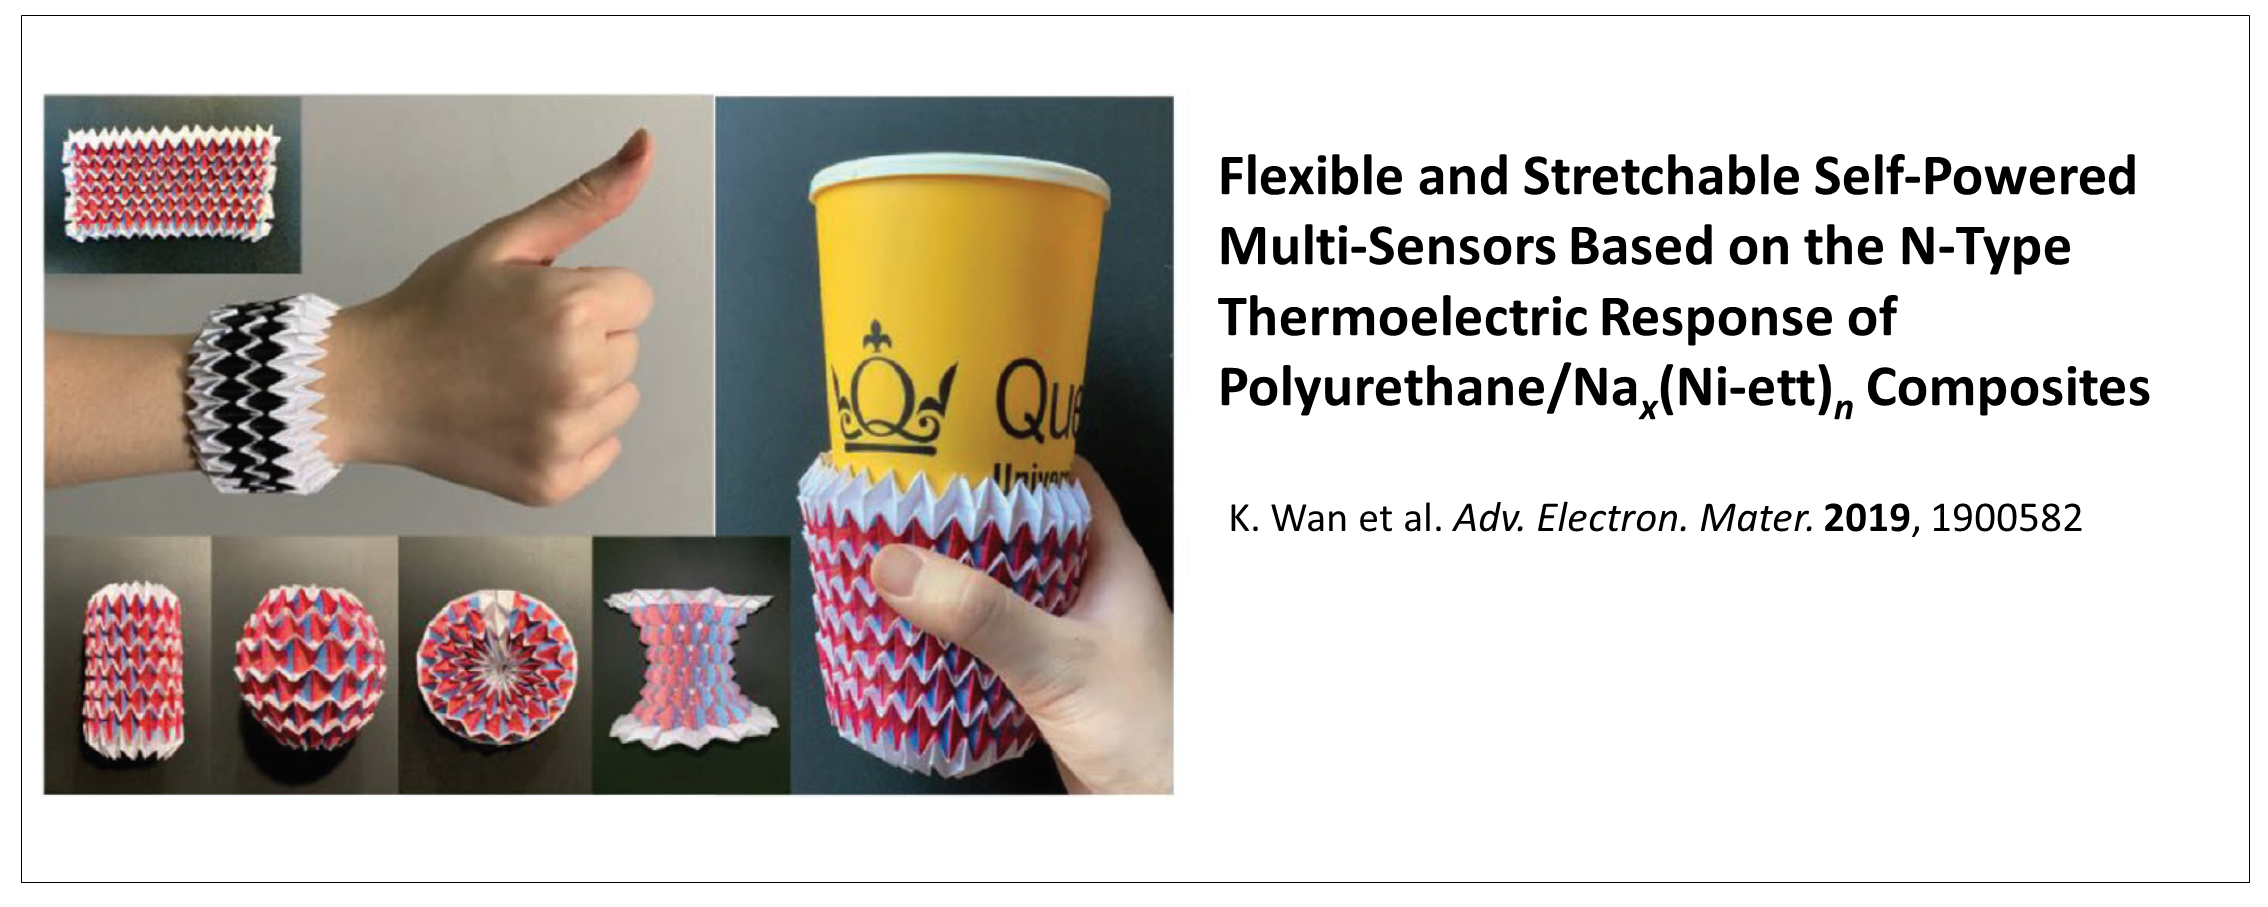 The Organic Thermoelectrics Laboratory